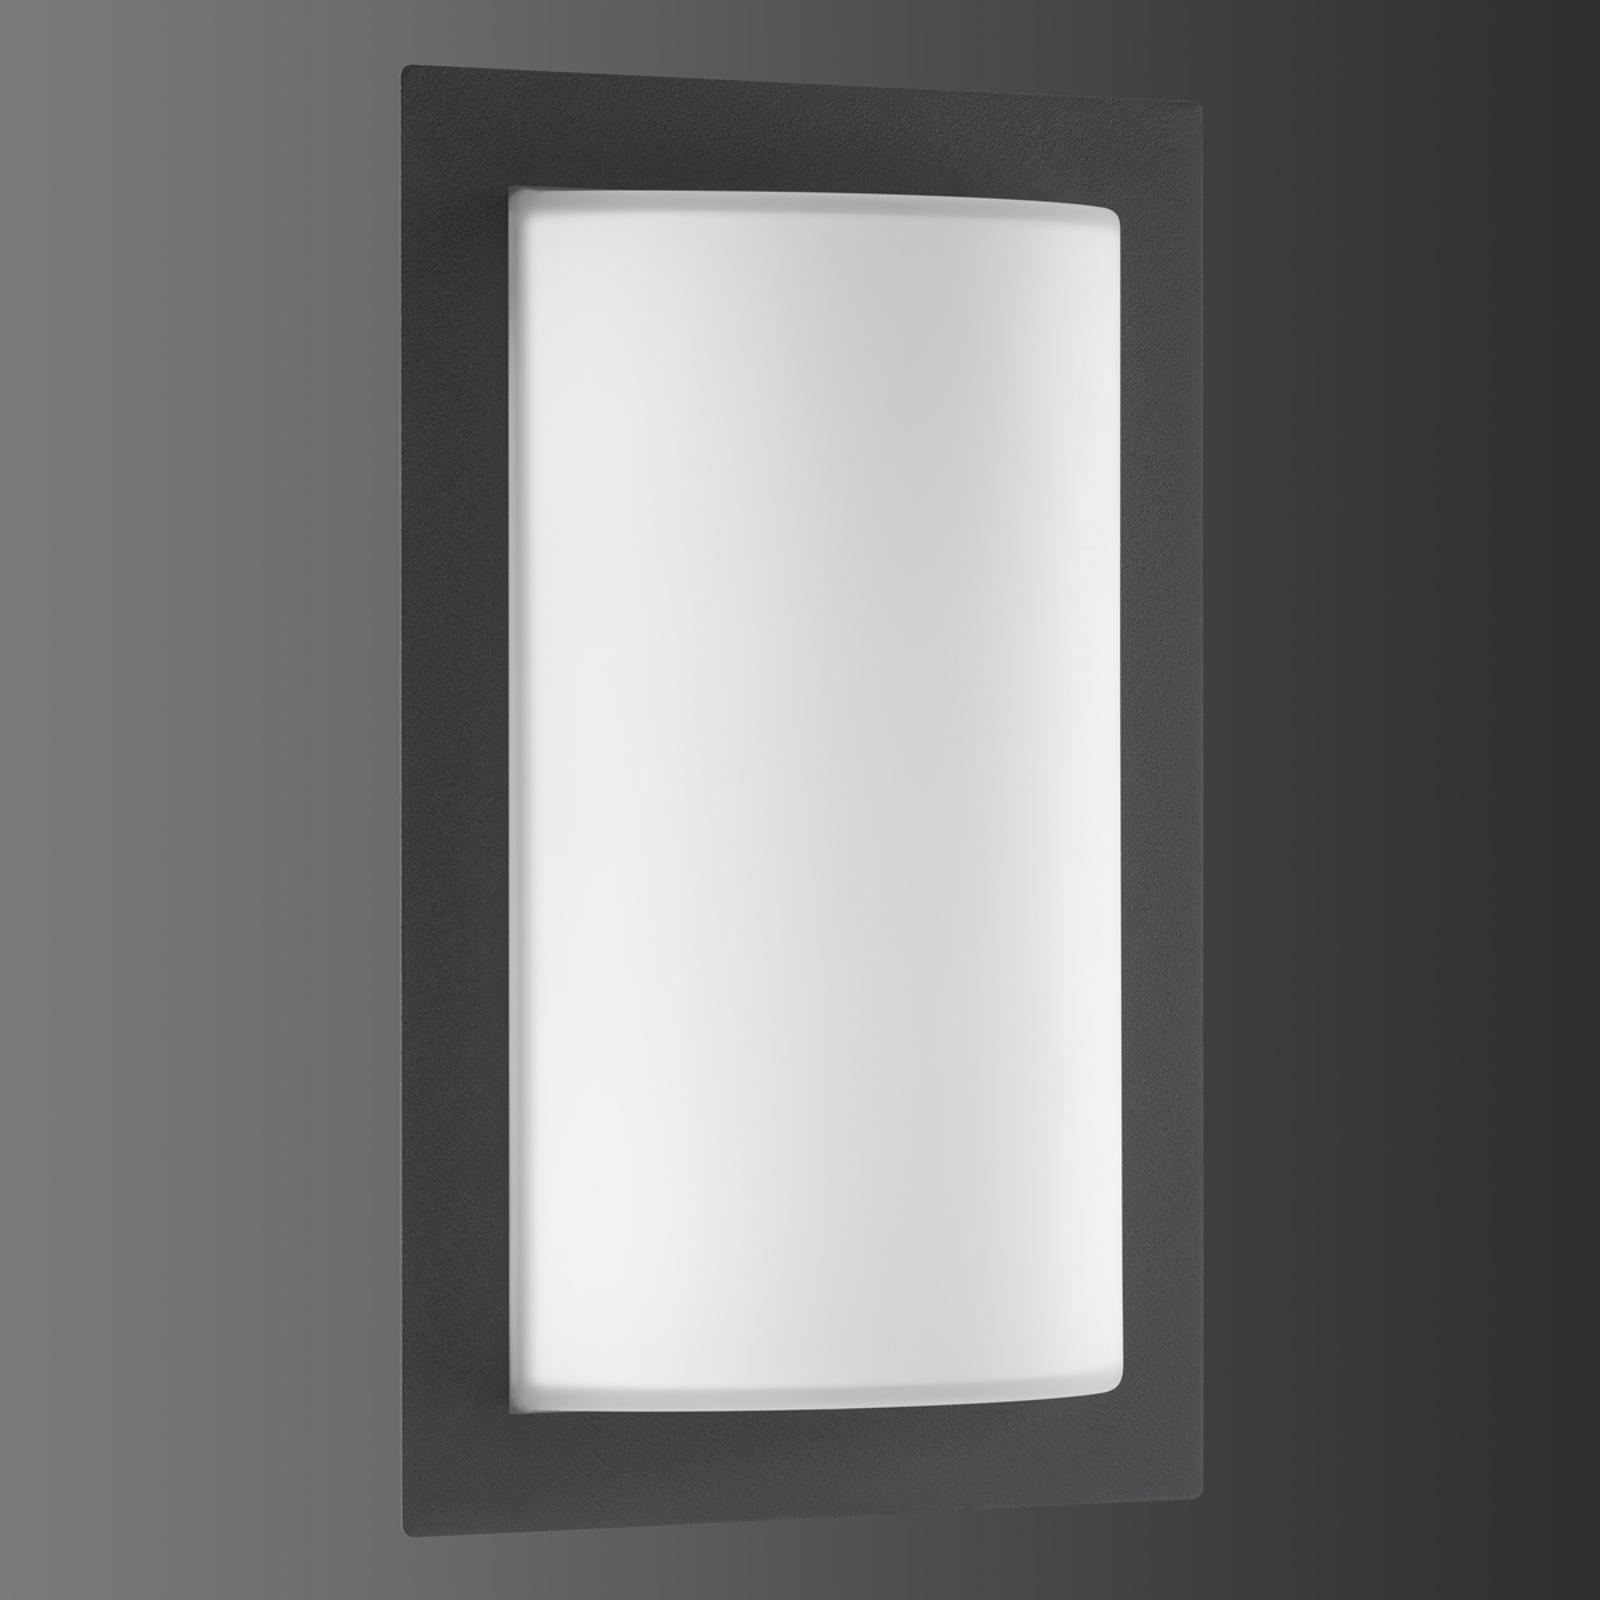 Grafietkleurige buitenwandlamp Luis m. LED licht